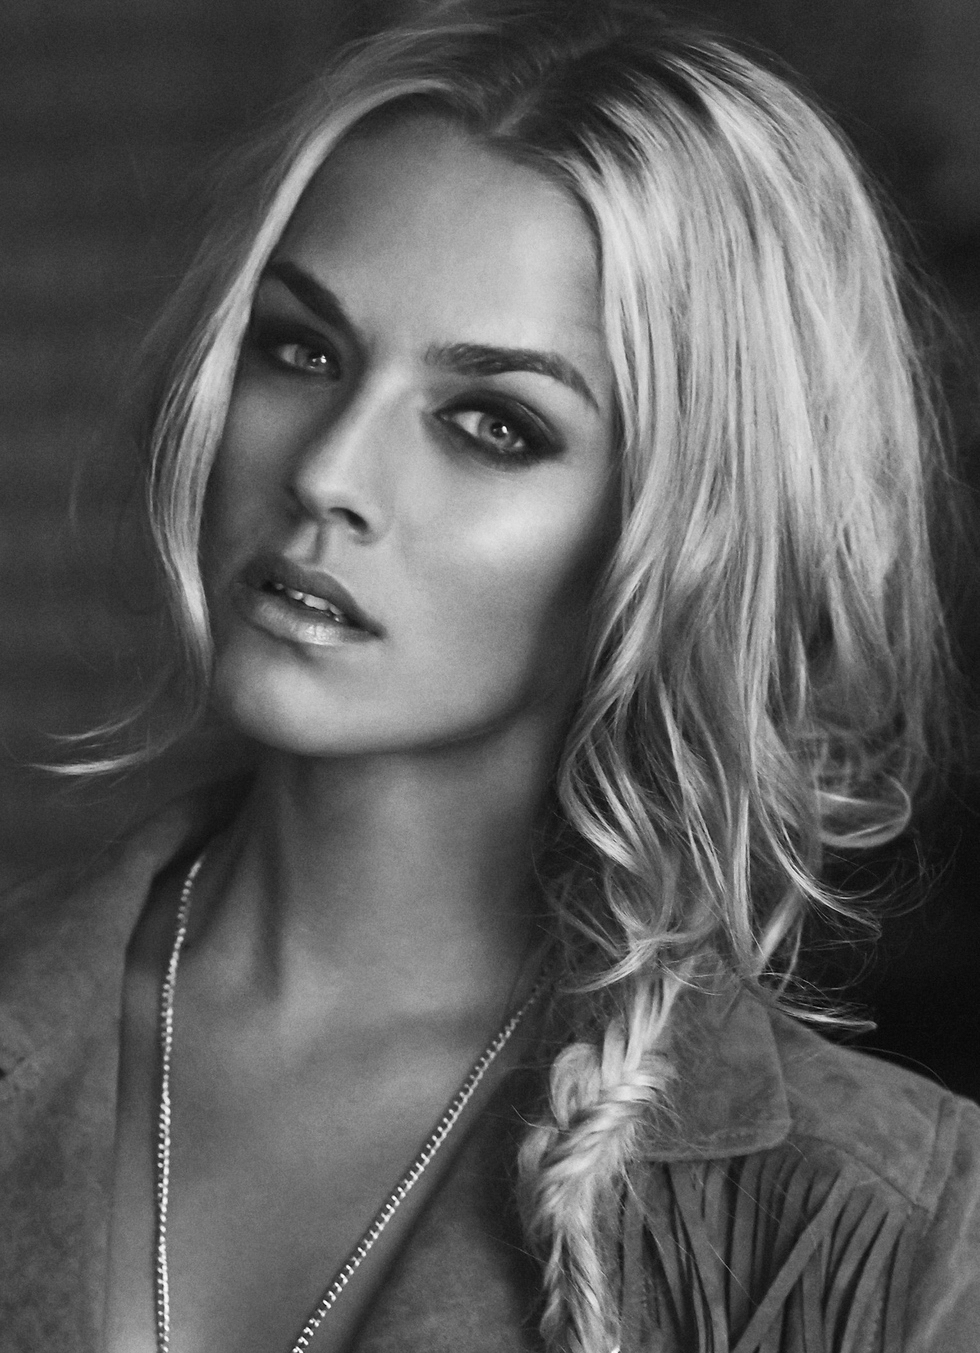 Images Johanna Thuresson nude photos 2019